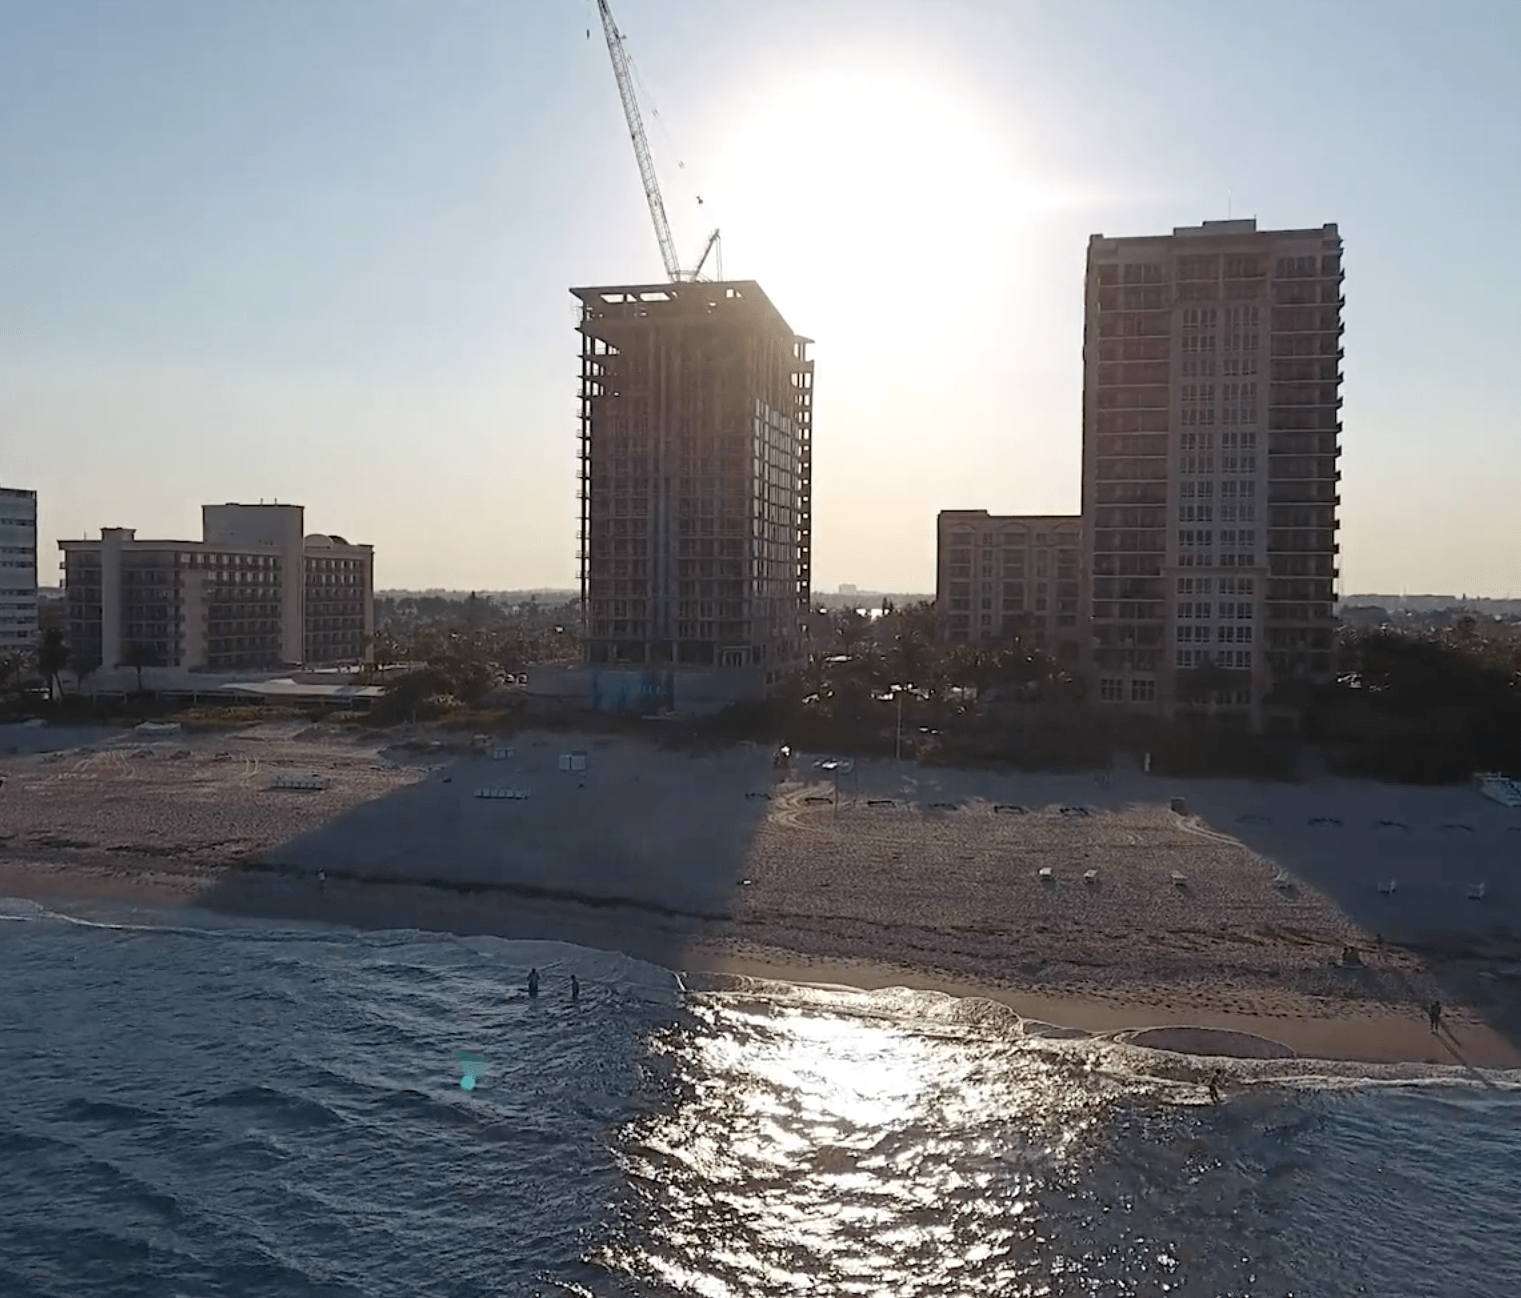 Construction Progress Update – Week Ending 04/21/17